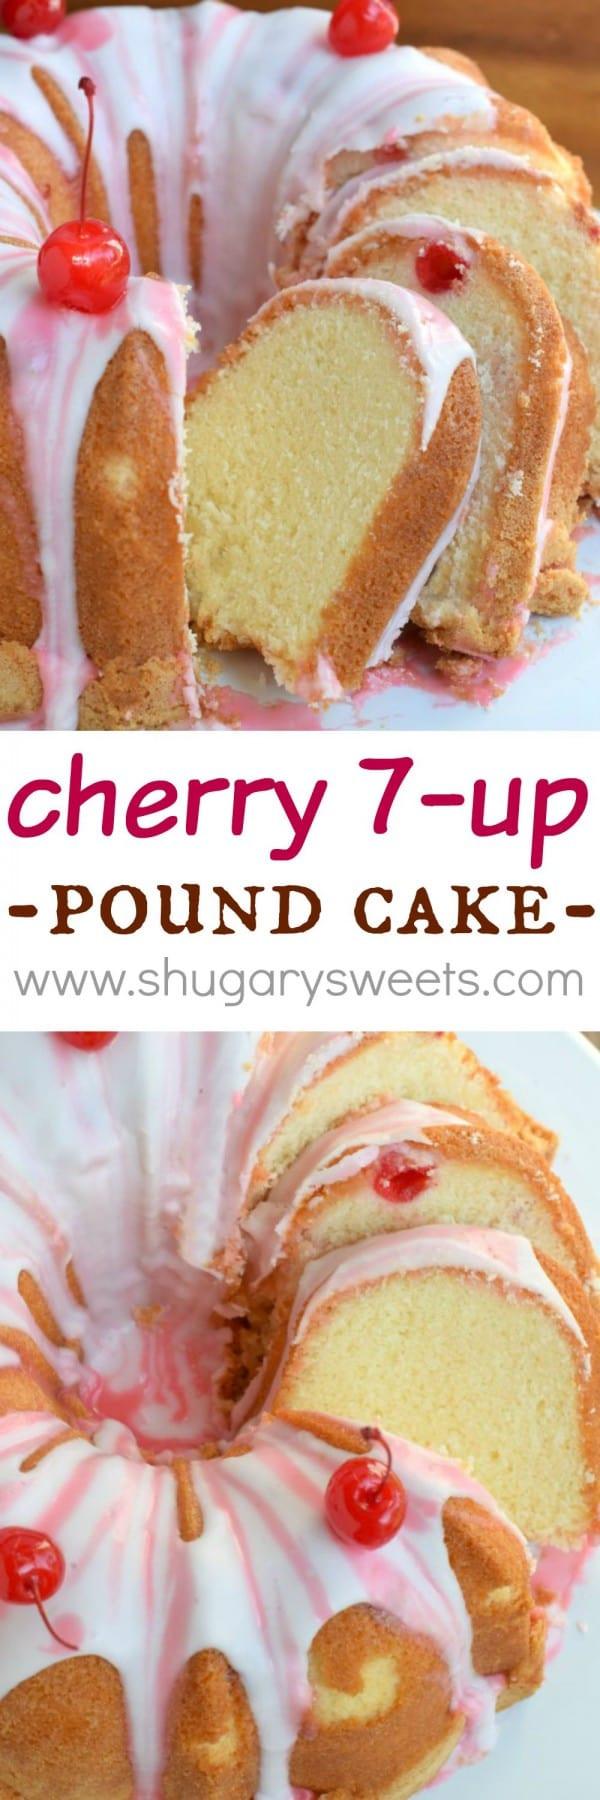 7 Up Pound Cake  Cherry 7 Up Pound Cake Shugary Sweets